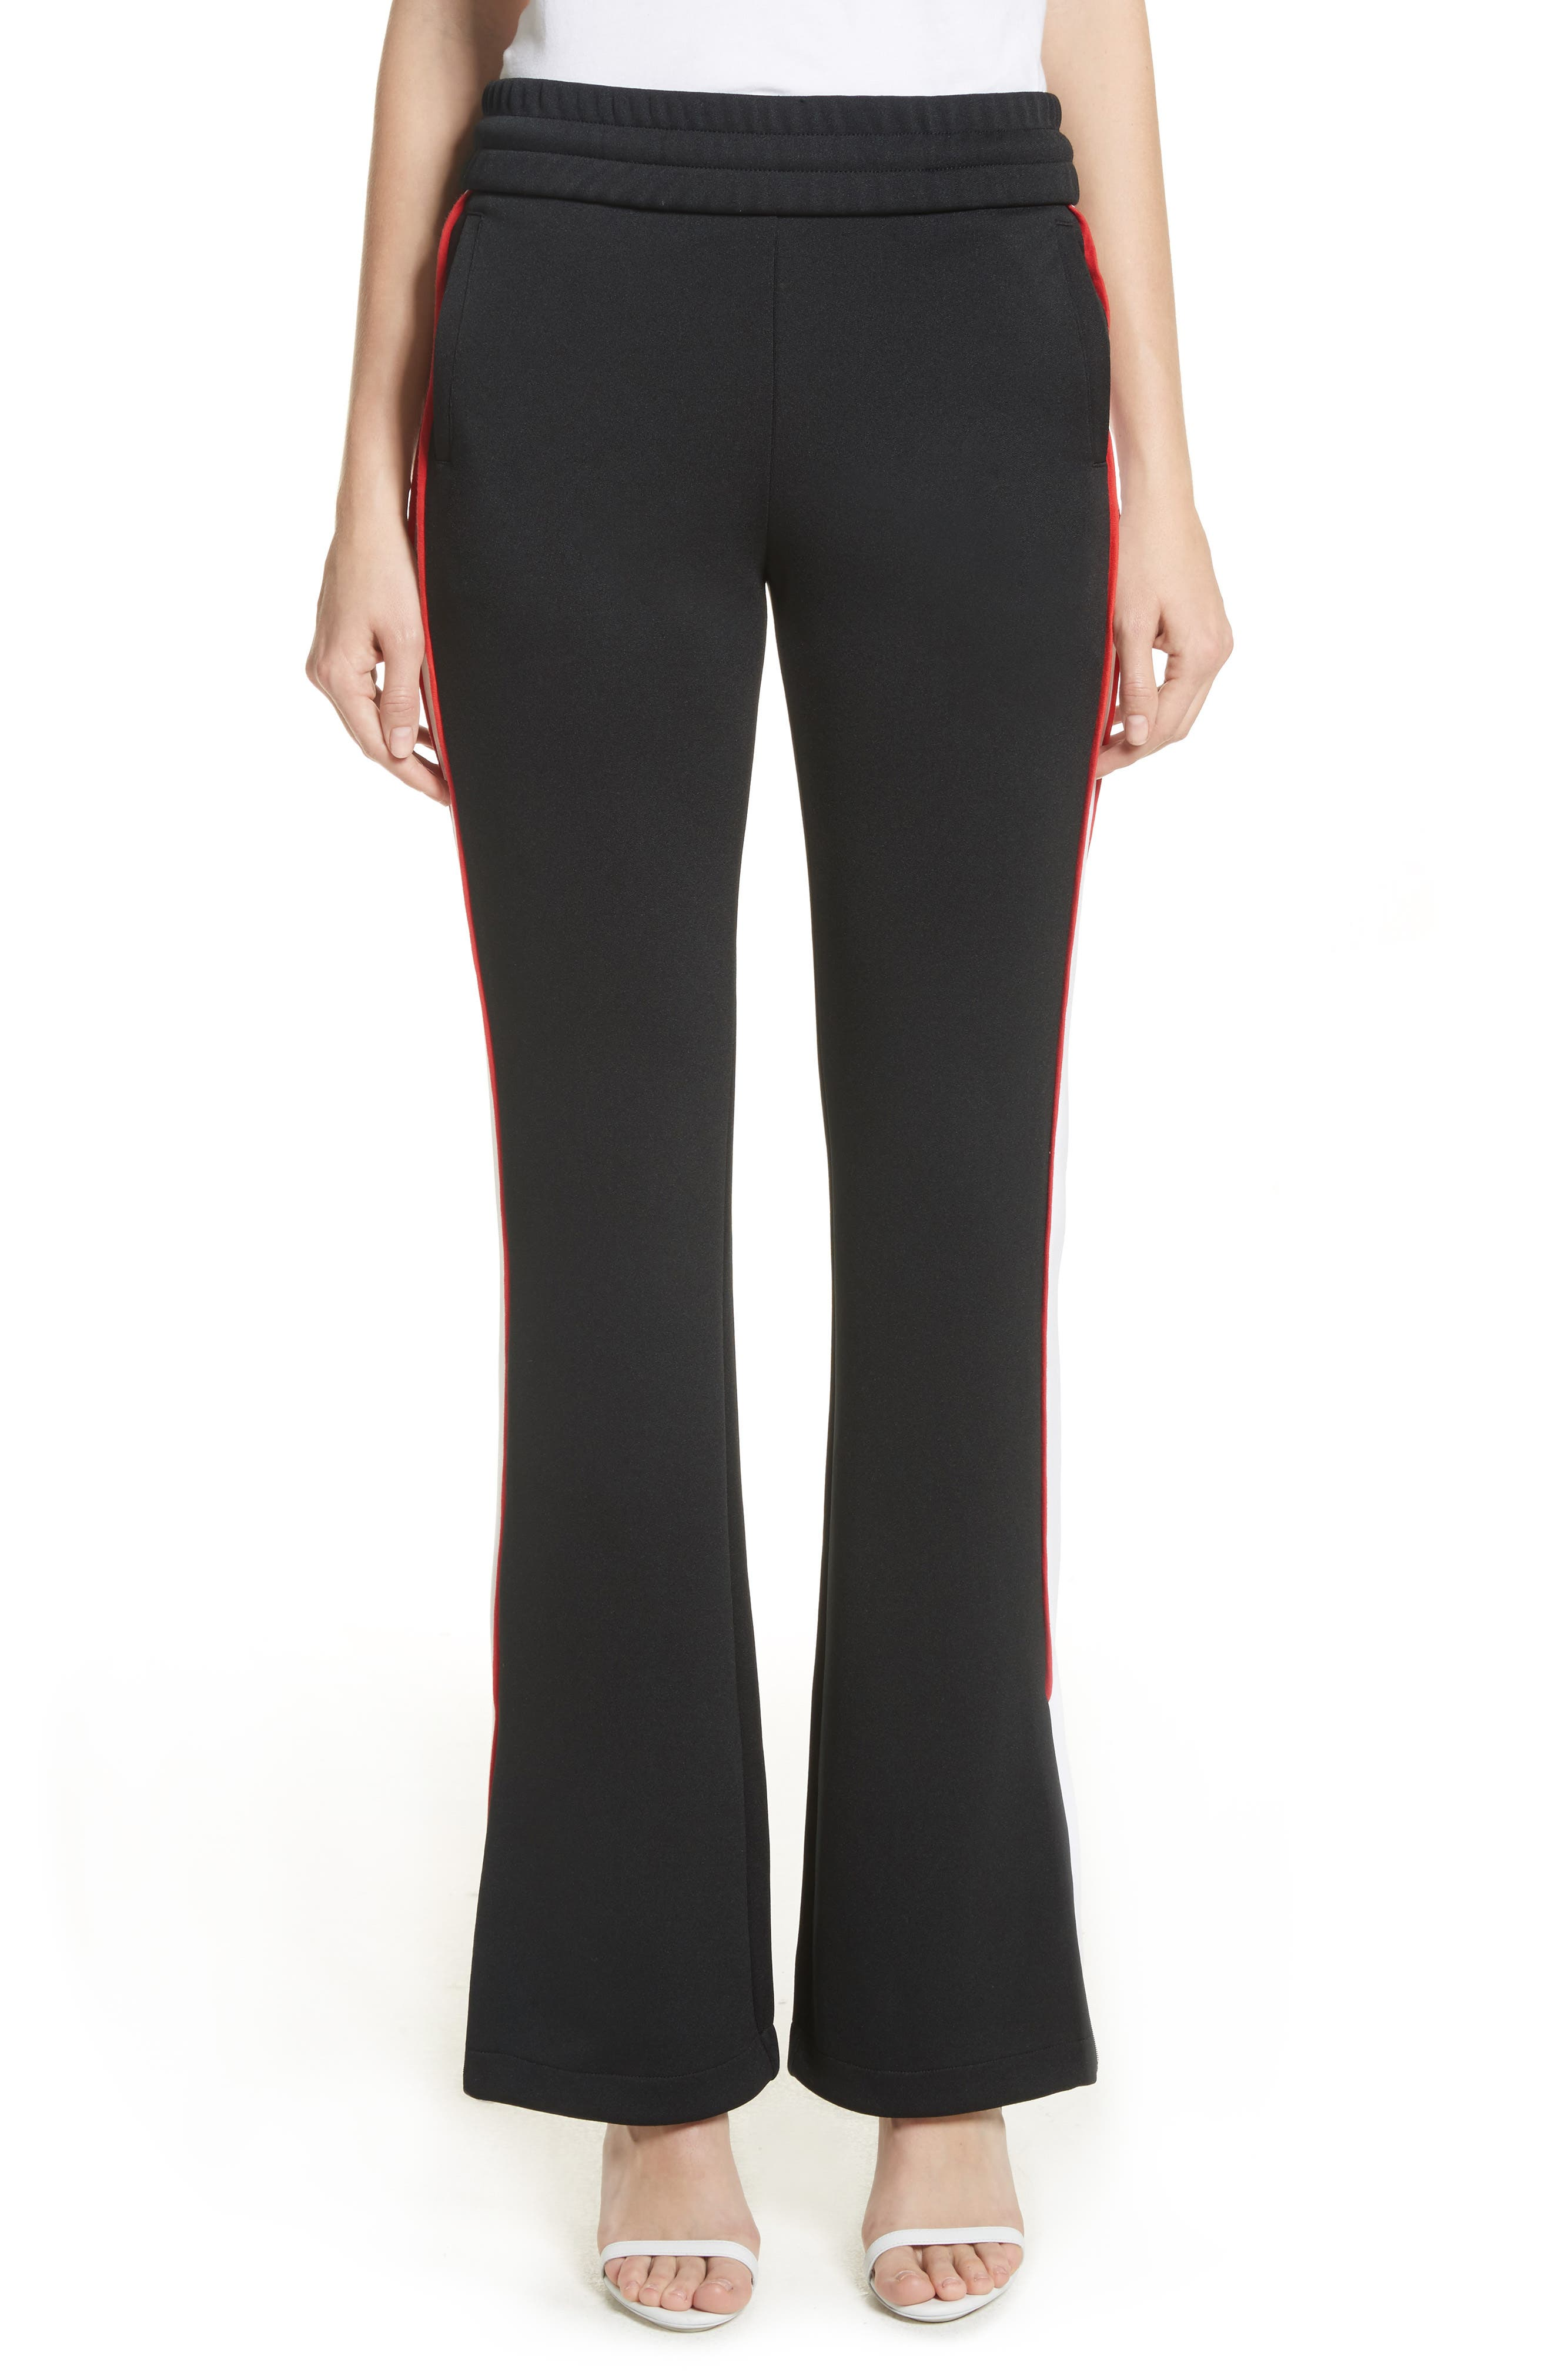 Flare Leg Track Pants,                             Main thumbnail 1, color,                             Black/ No Color